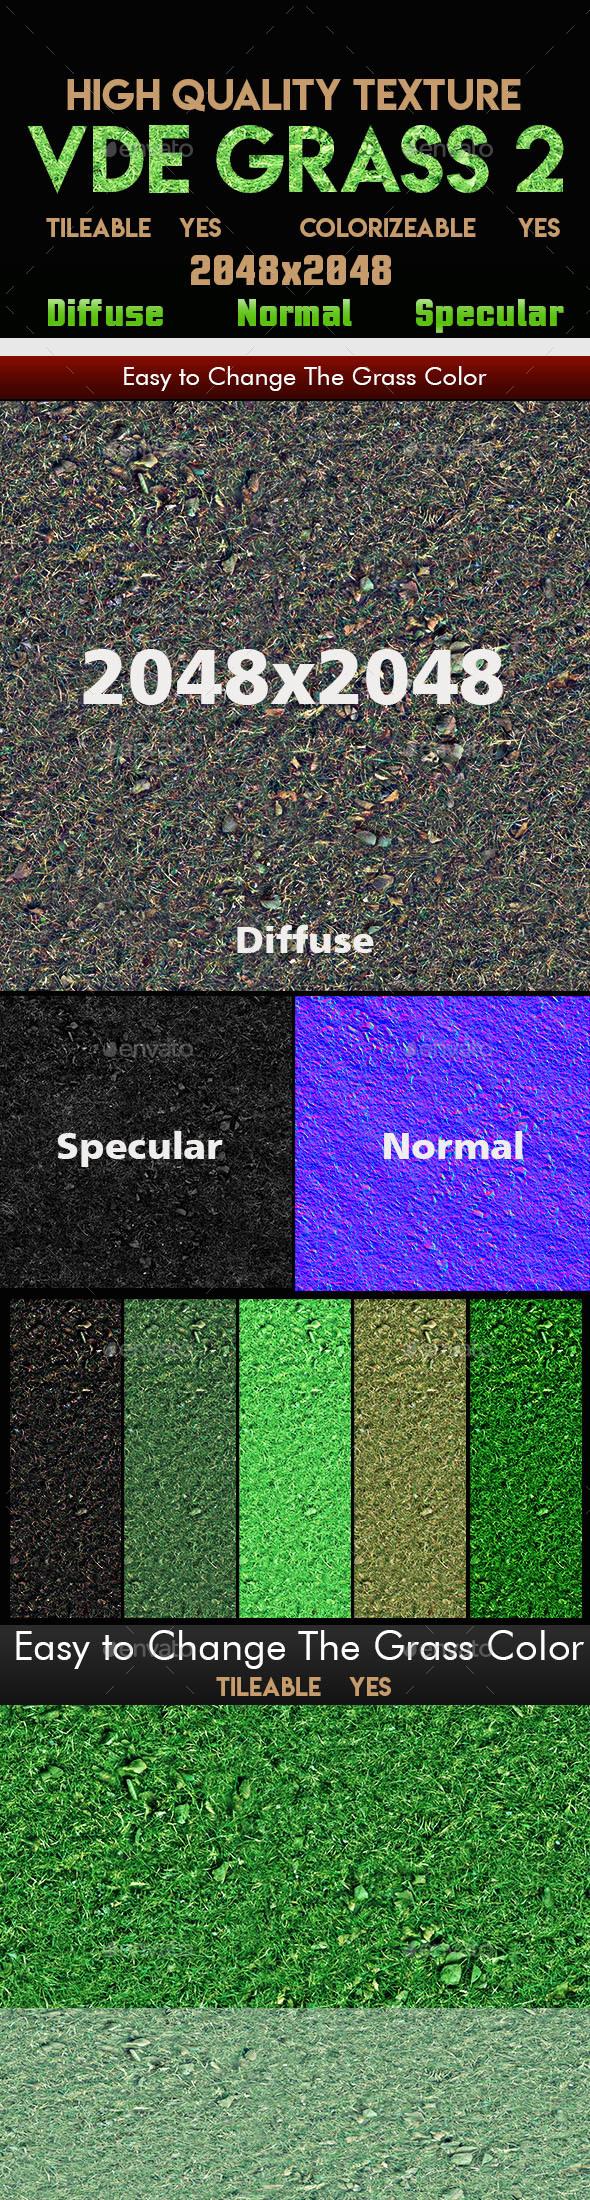 VDE_Grass_2_UHD_Tileable_Texture - 3DOcean Item for Sale